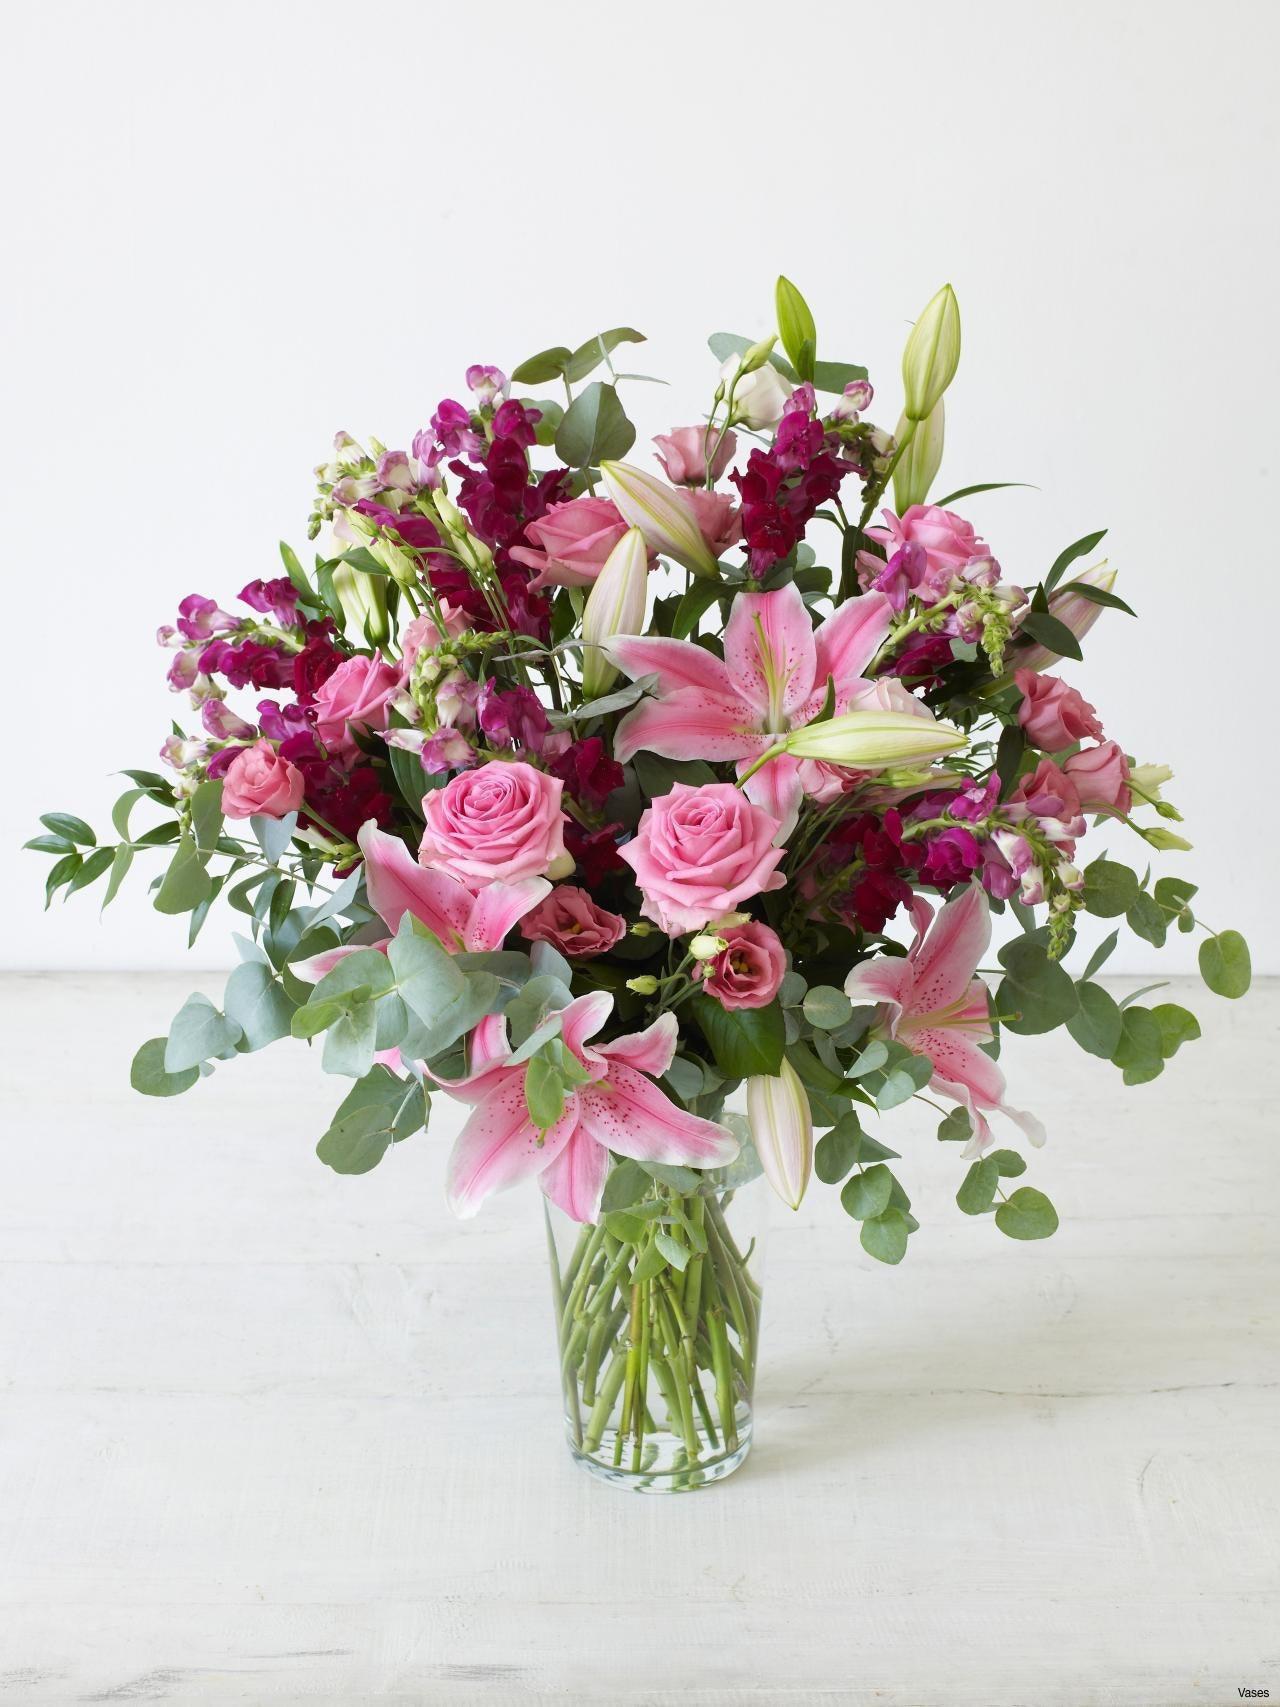 Flower Arrangements Elegant Floral Arrangements 0d Design Ideas Design Ideas January Birthday Flower